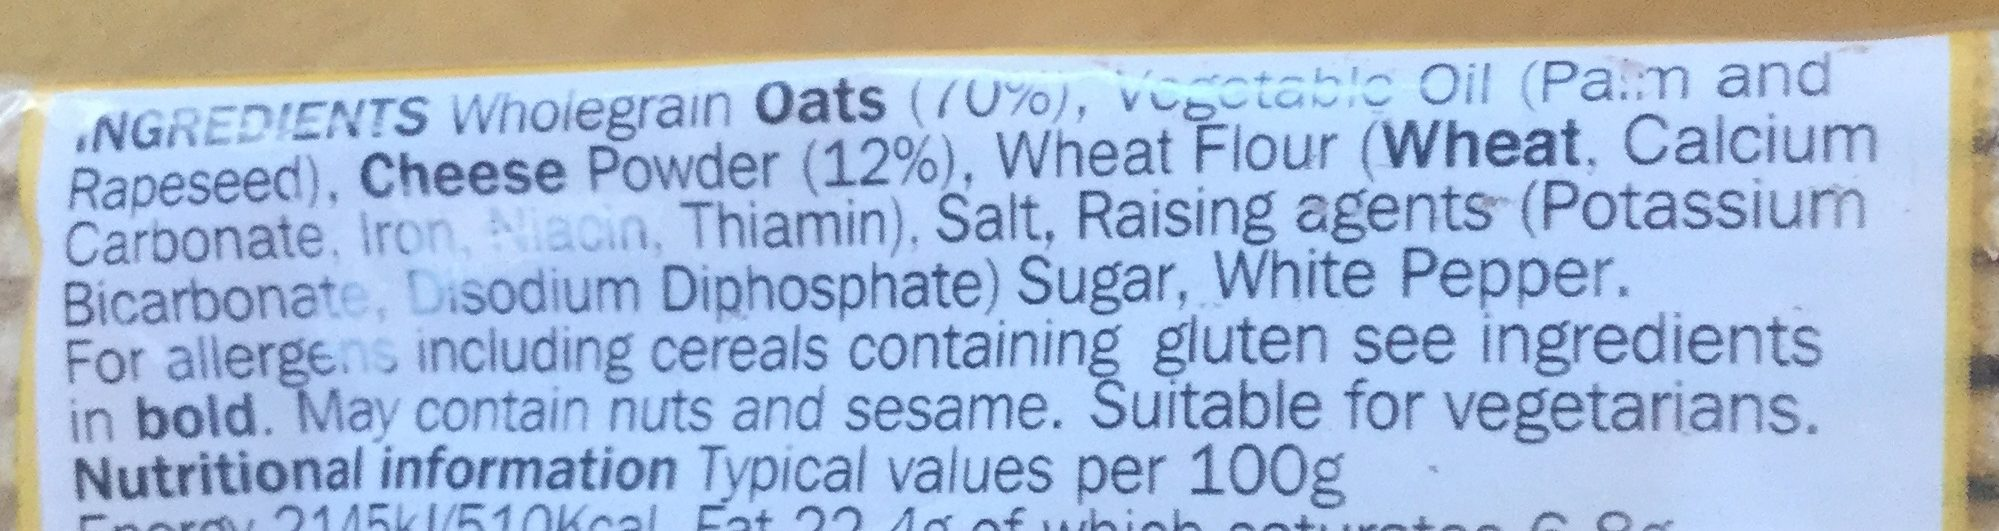 Orkney cheese Oatcakes - Ingredients - en